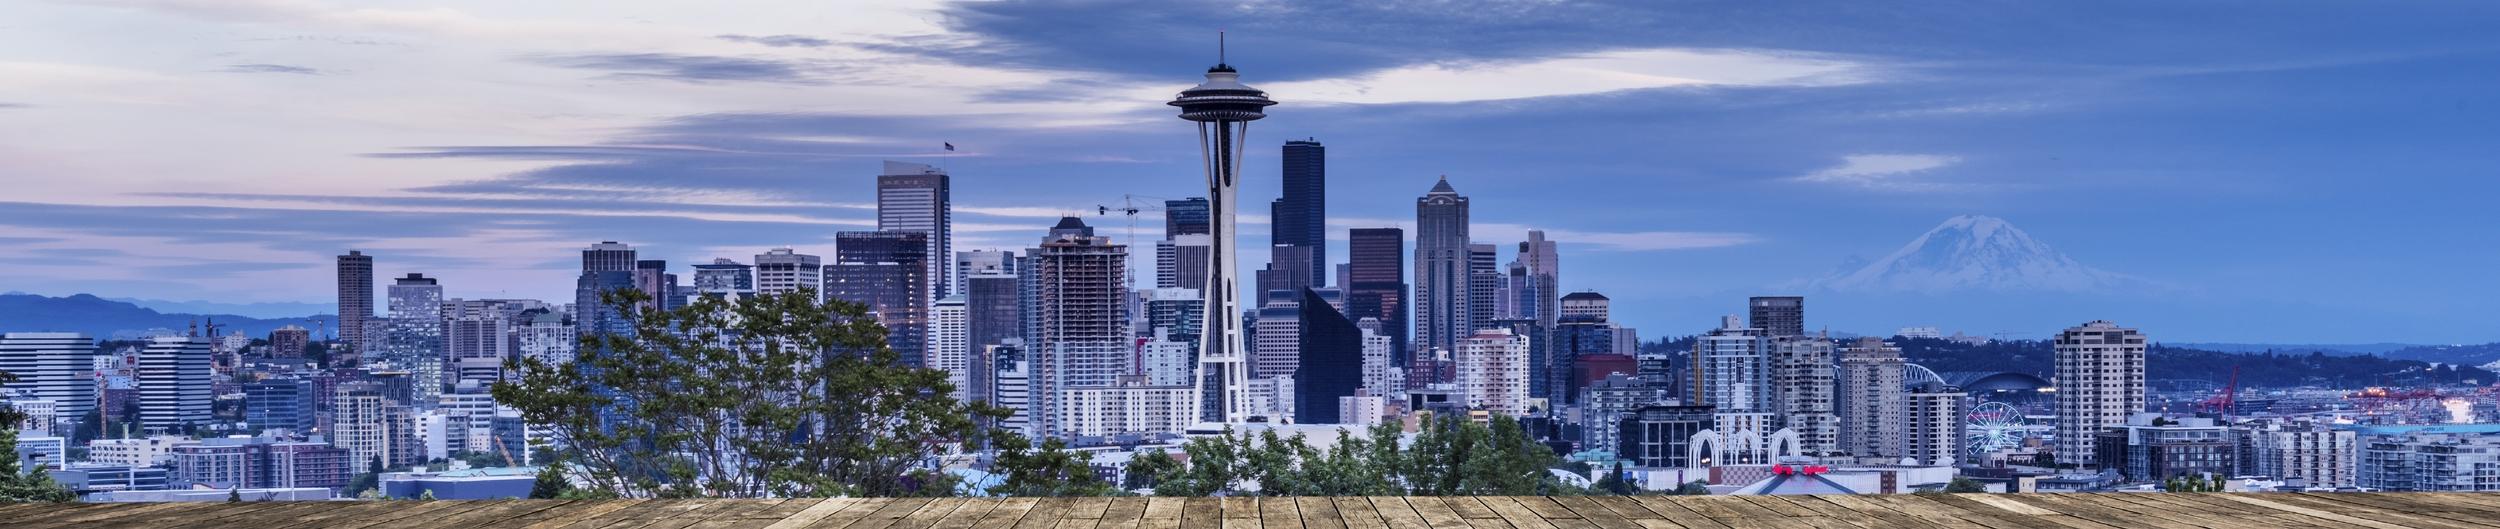 Top 10 Seattle Web Design and Development Agencies